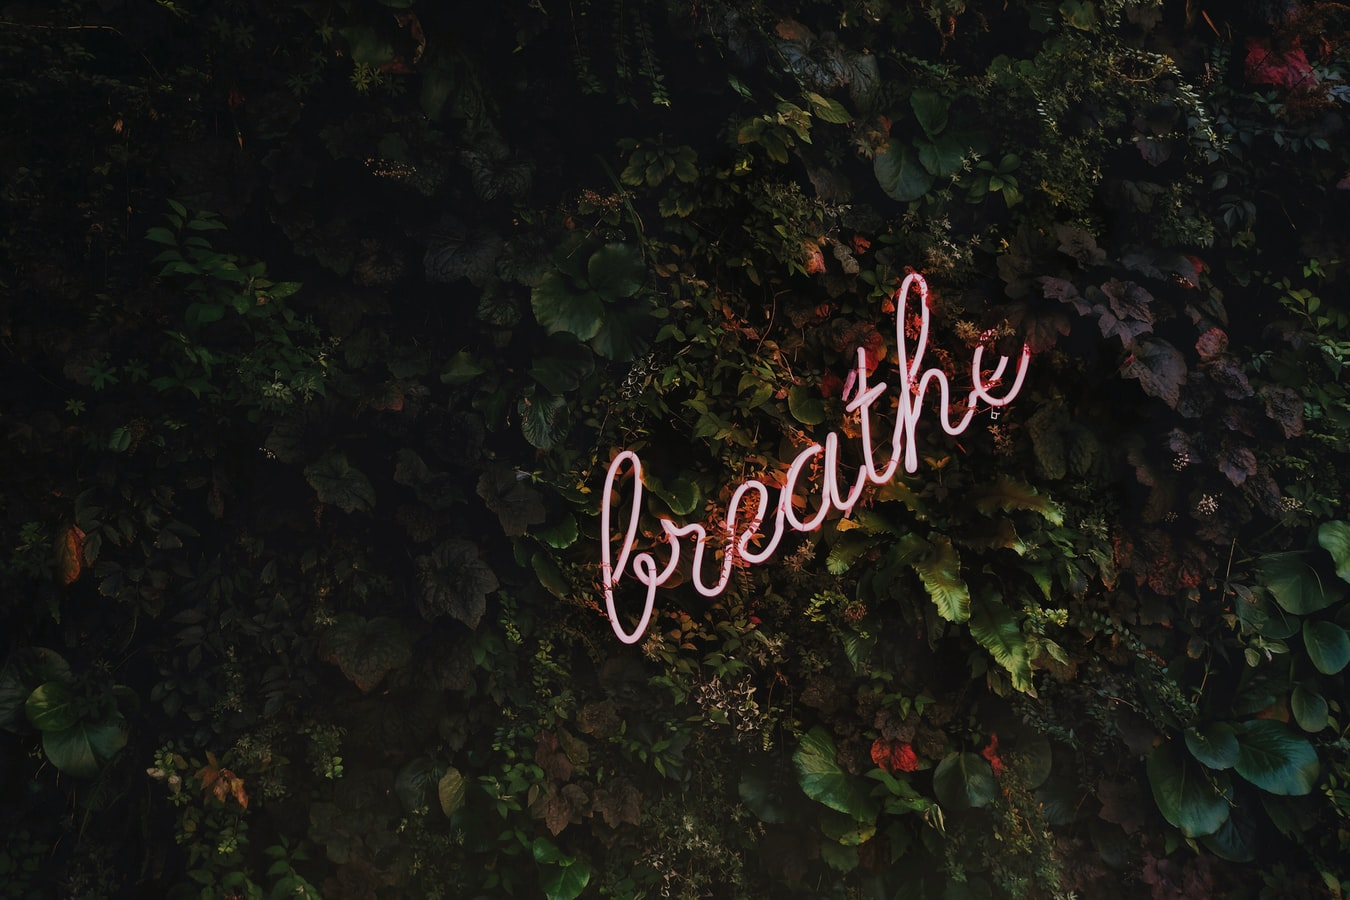 Breathe neon sign on faliage background